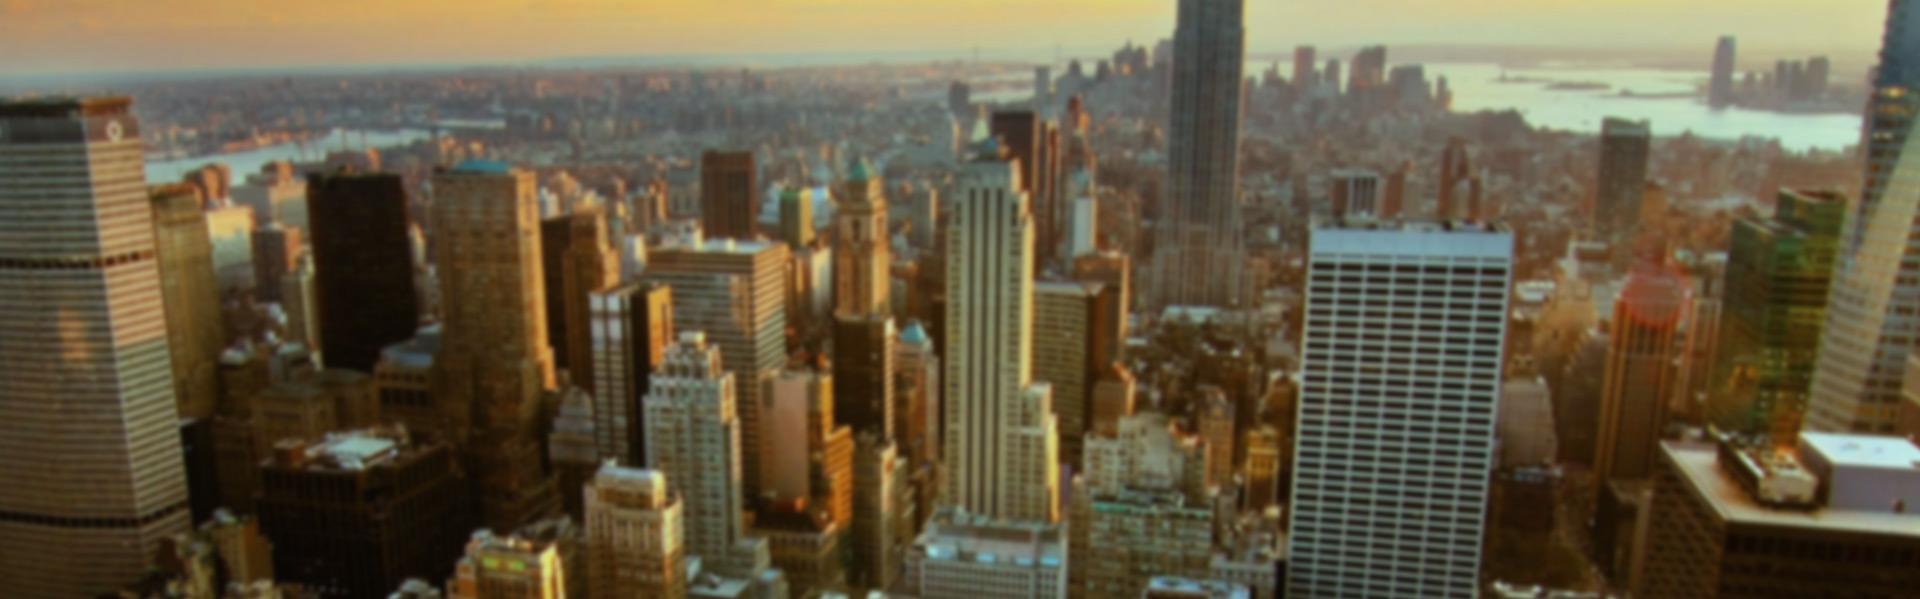 City-blur